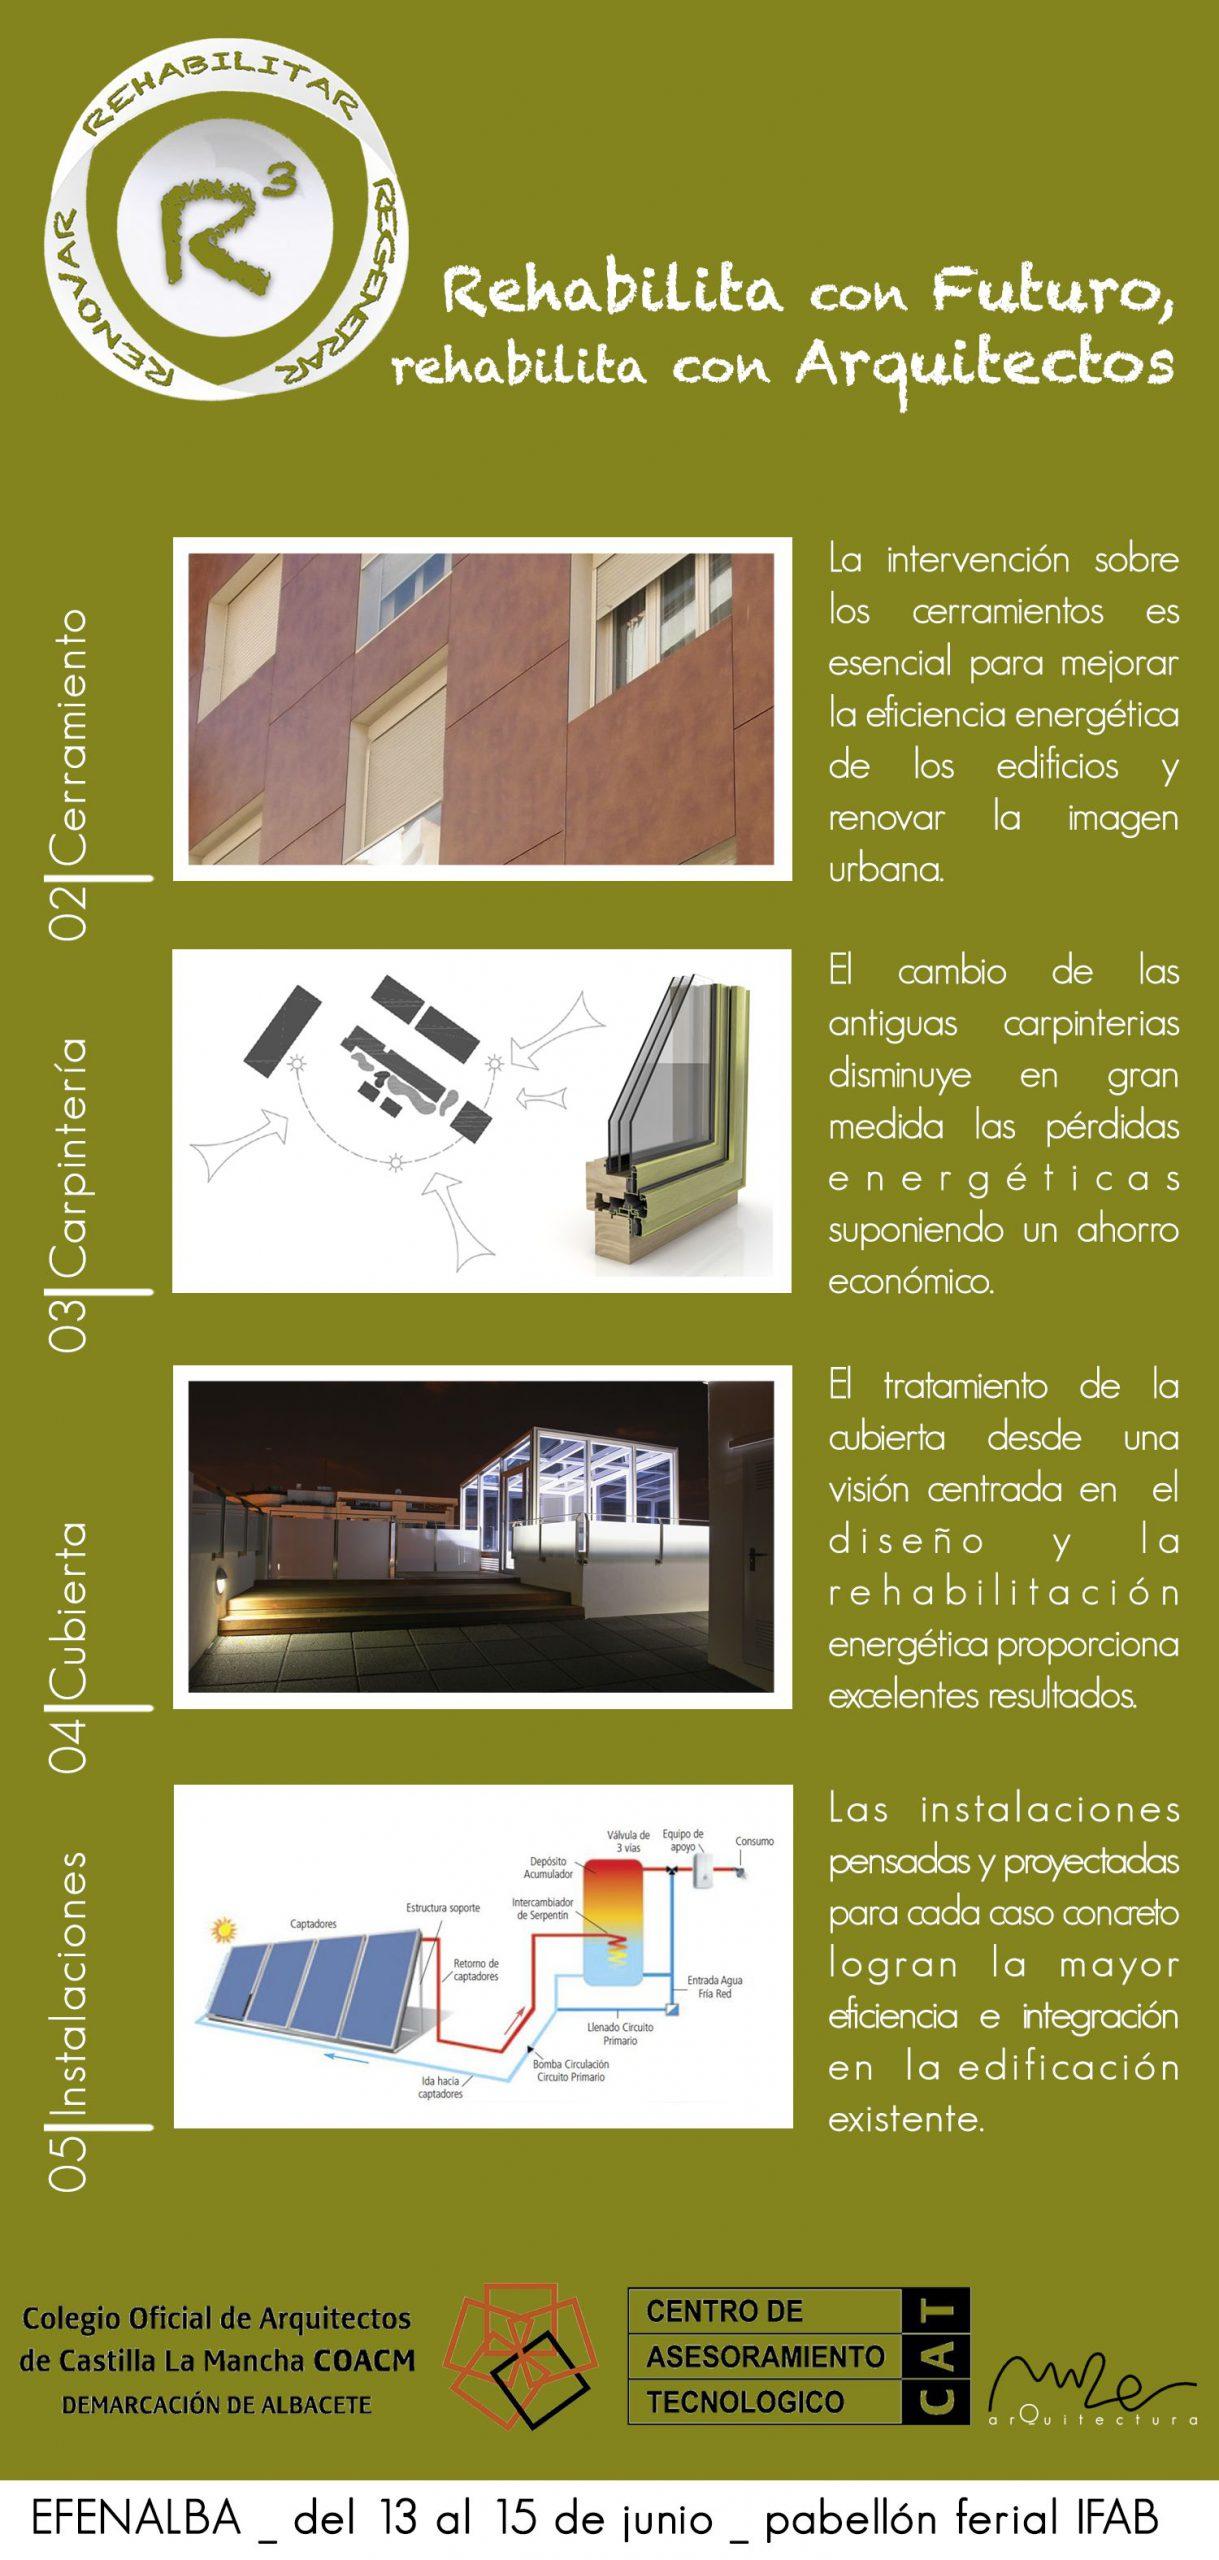 folleto efenalba B